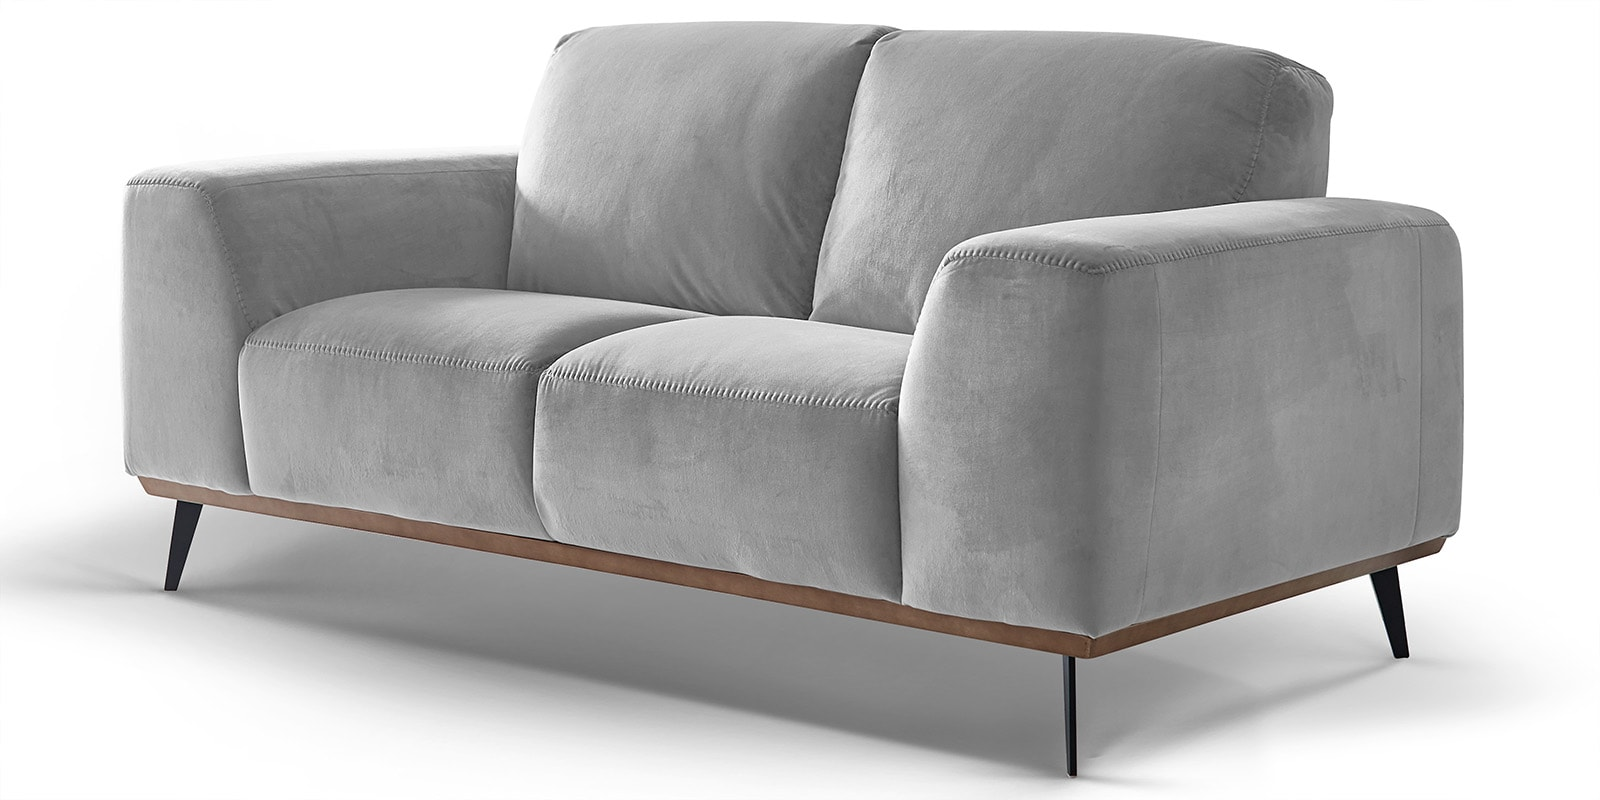 Moebella24 - 2-Sitzer - Sofa - Barcelona - Samt - Grau - Skandinavisches - Design - Punto - cavallo - Nähte - Detailaufnahme